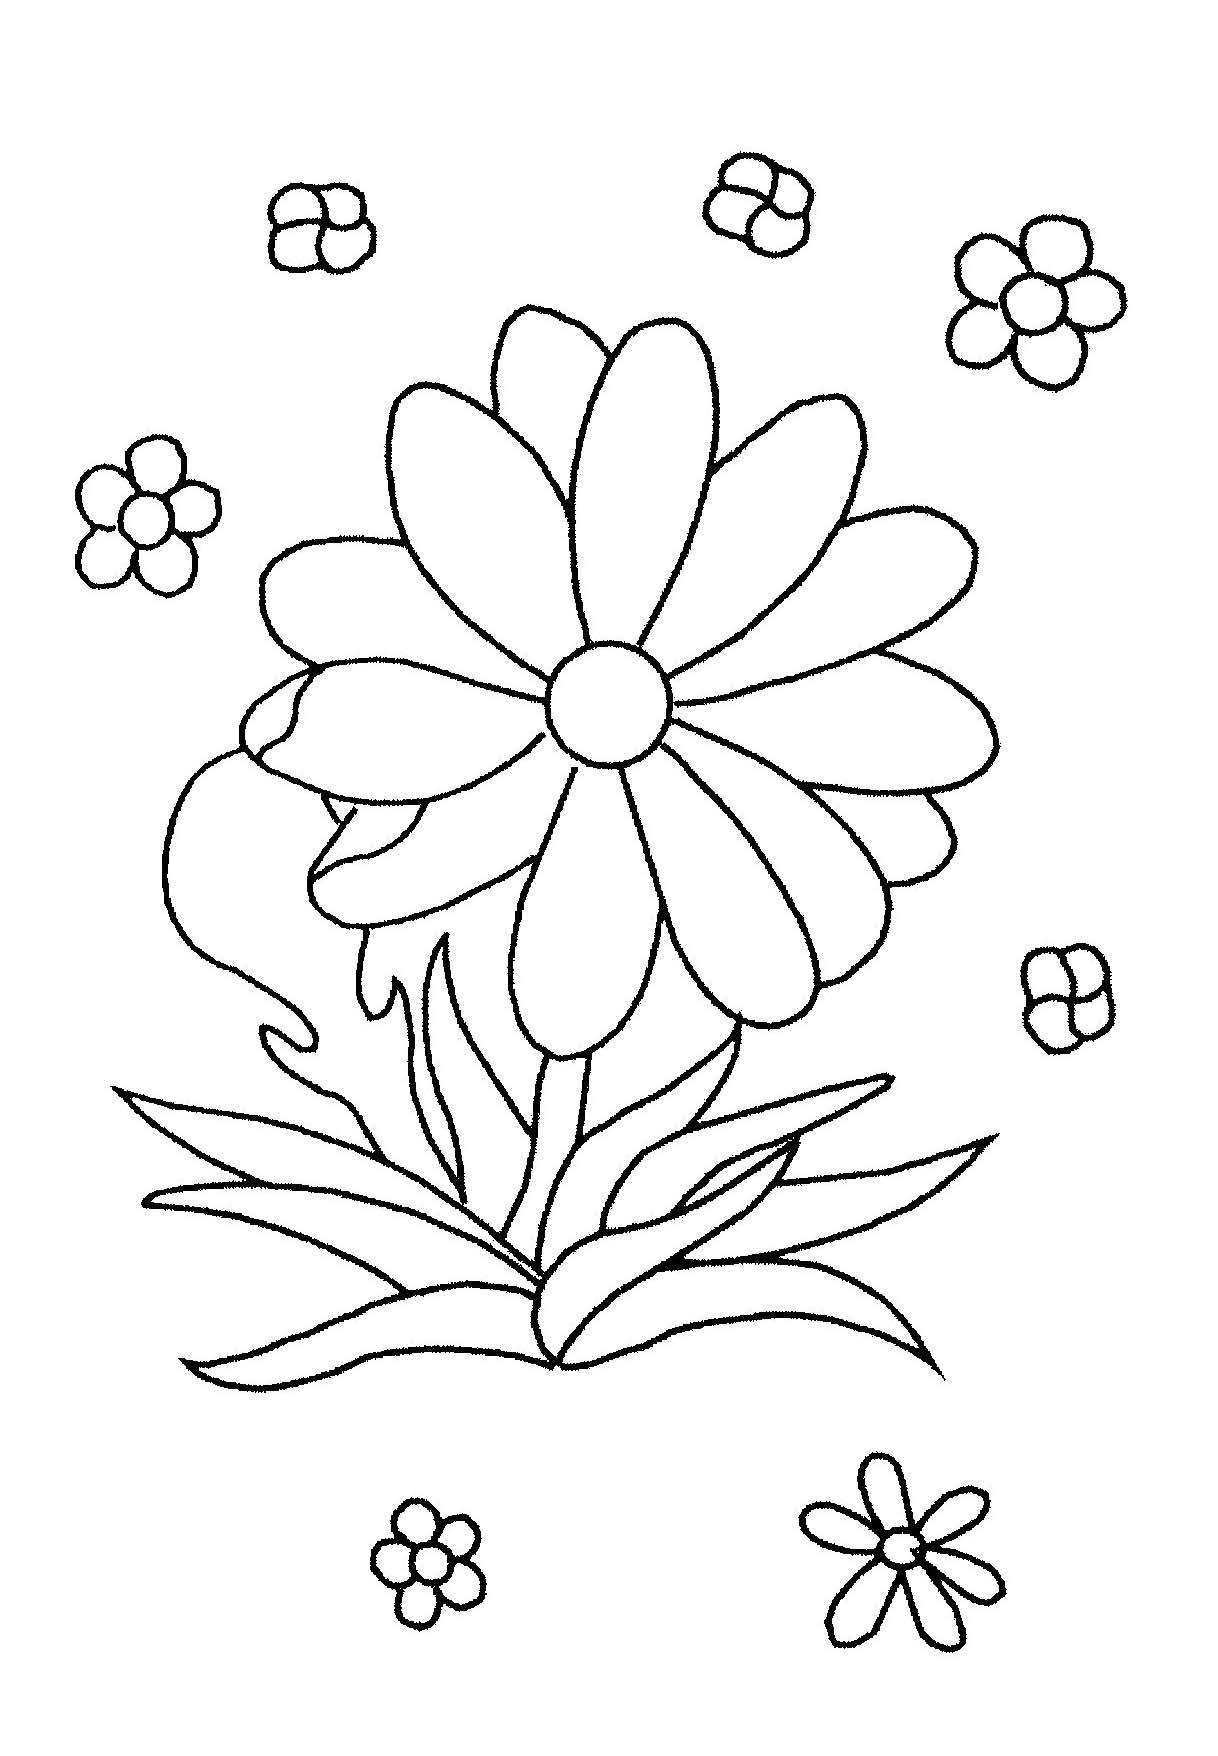 coloriage dessiner fleur en ligne gratuit. Black Bedroom Furniture Sets. Home Design Ideas